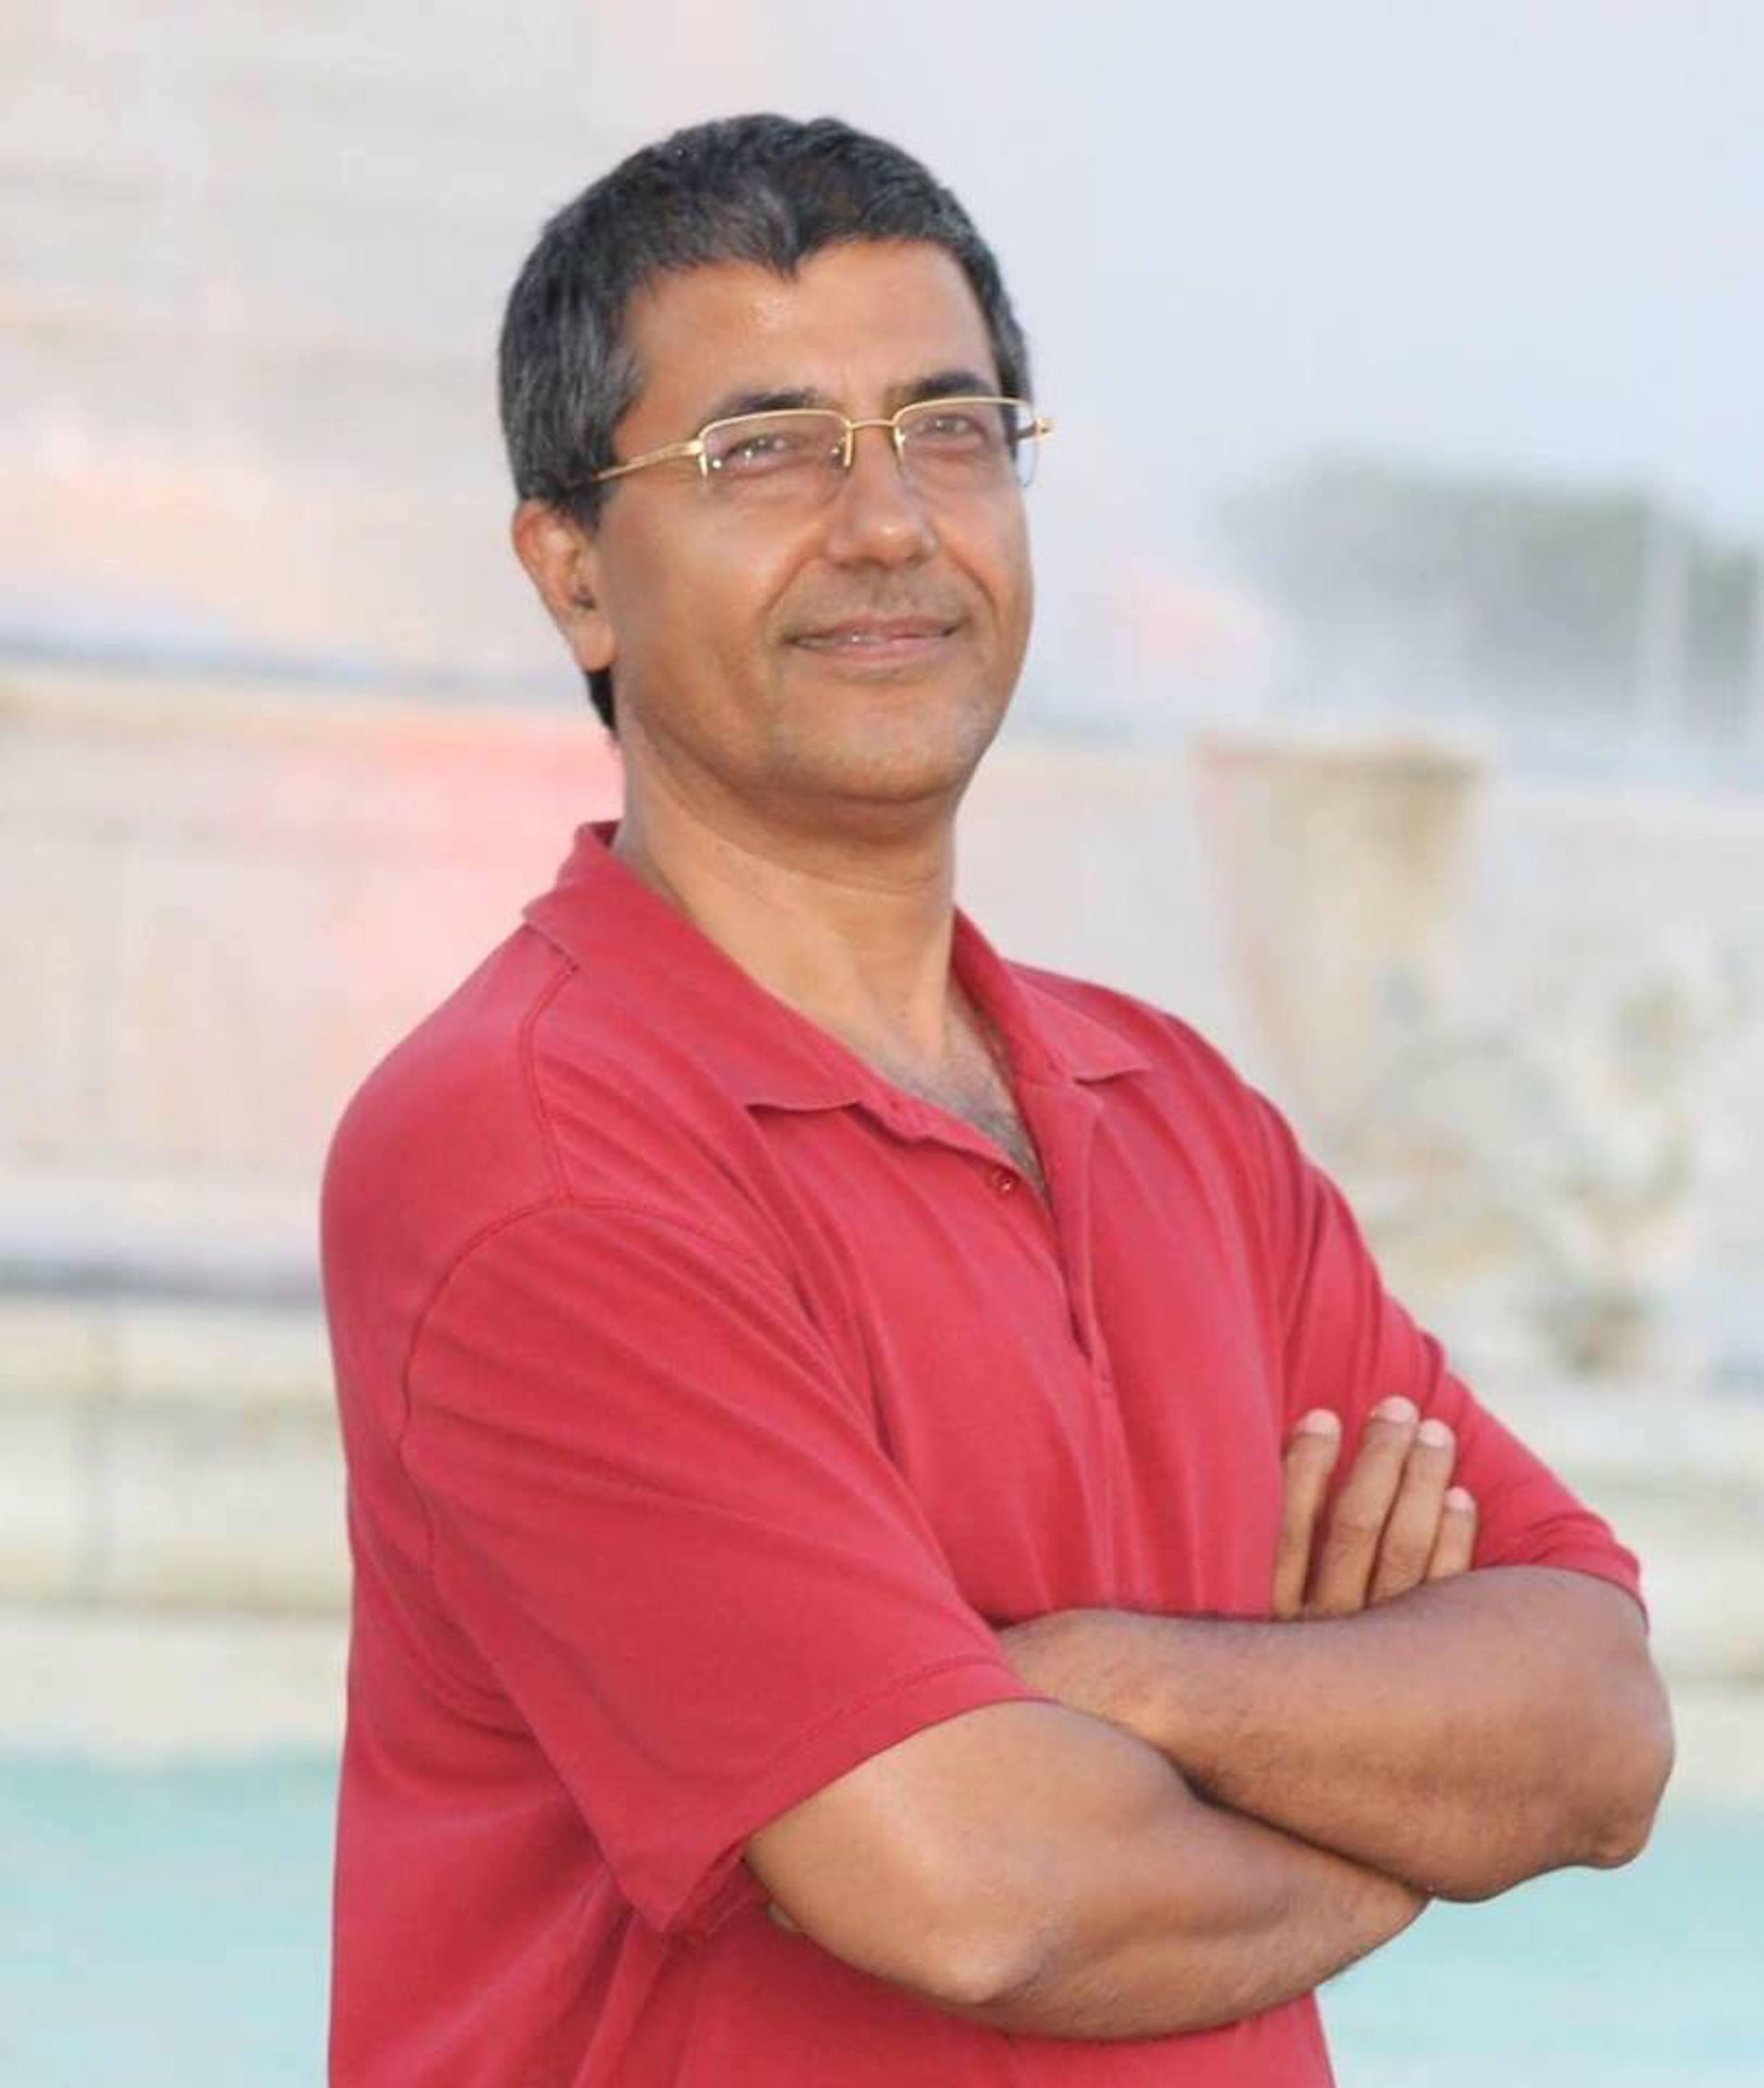 Samrat Upadhyay author